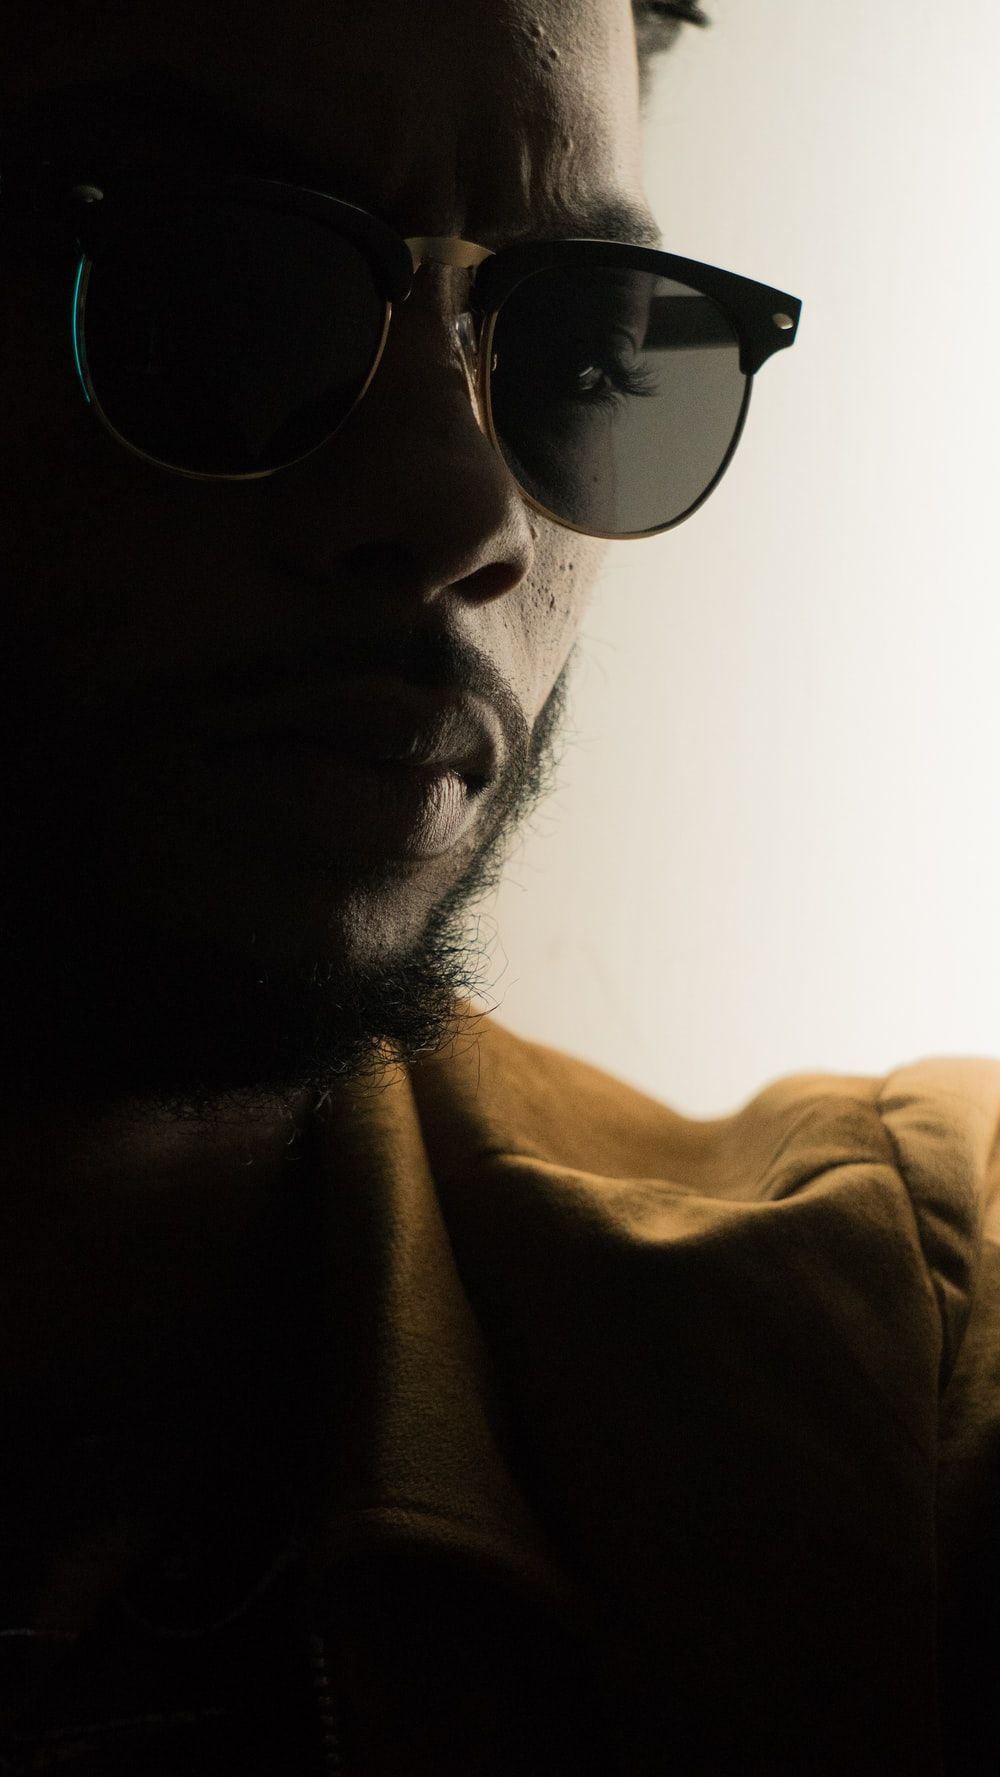 man's wearing sunglasses